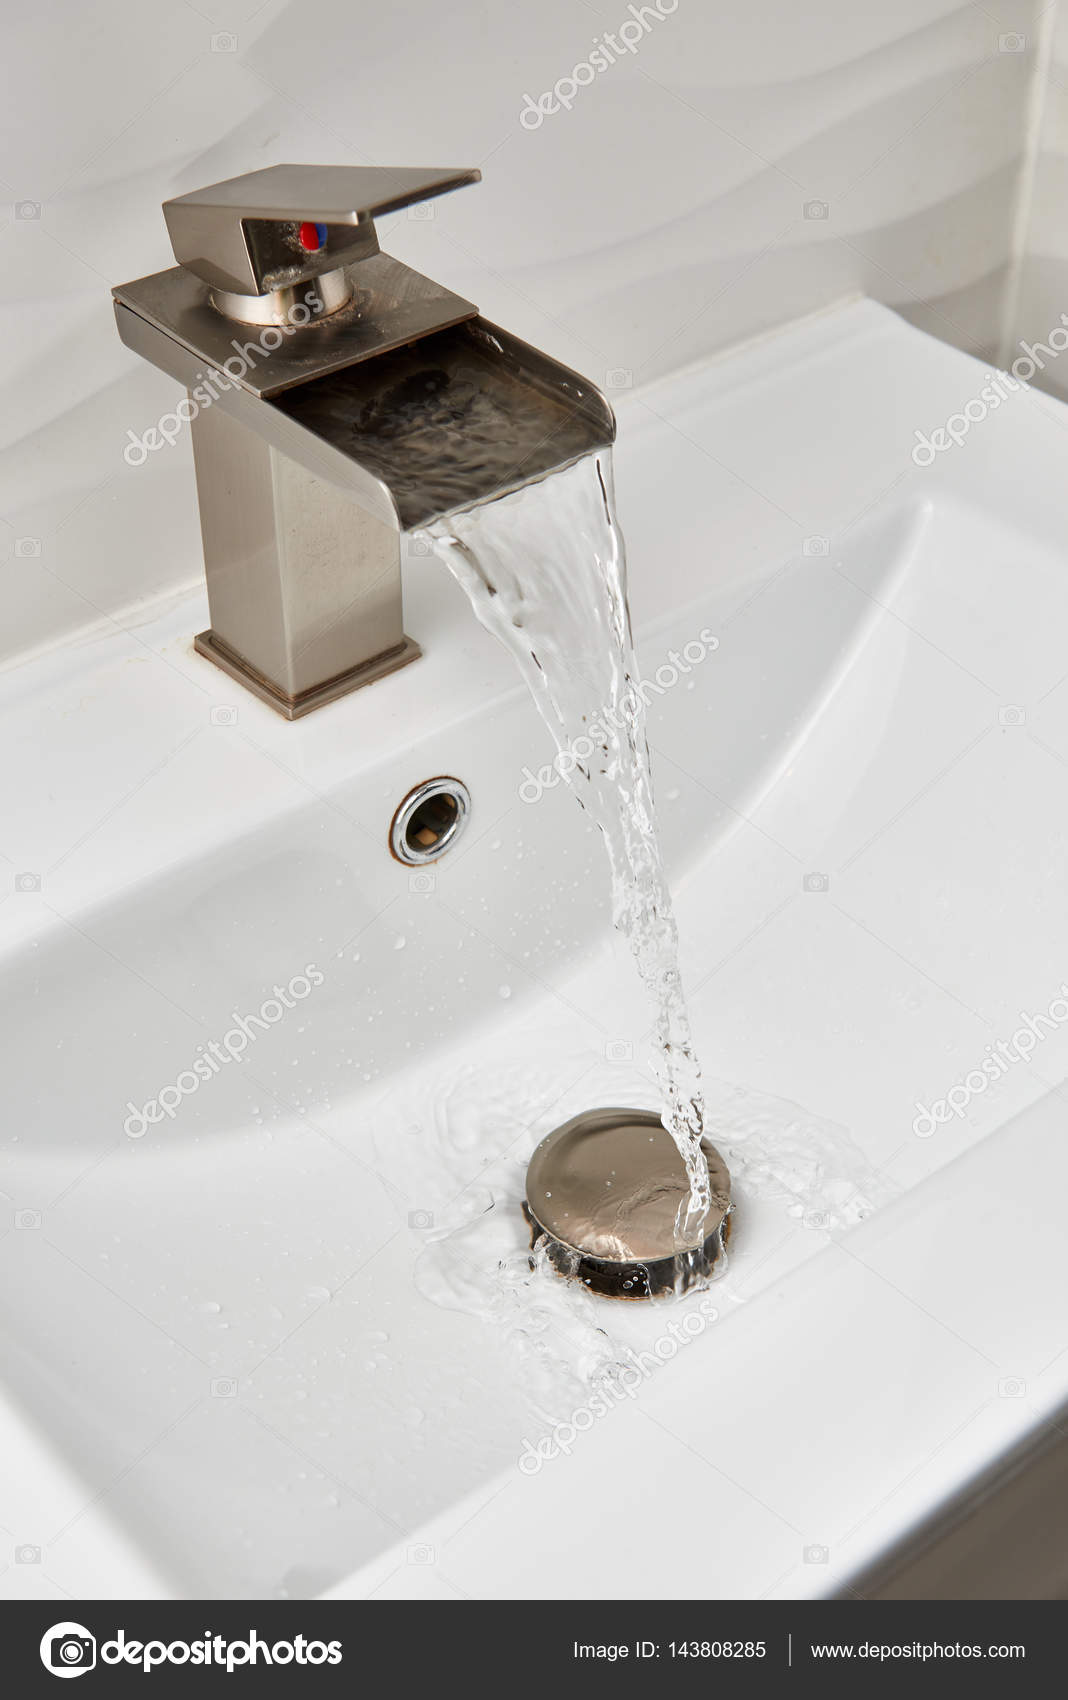 led modern agualights design en waterfall bathroom contemporary showerhead faucet kitchen